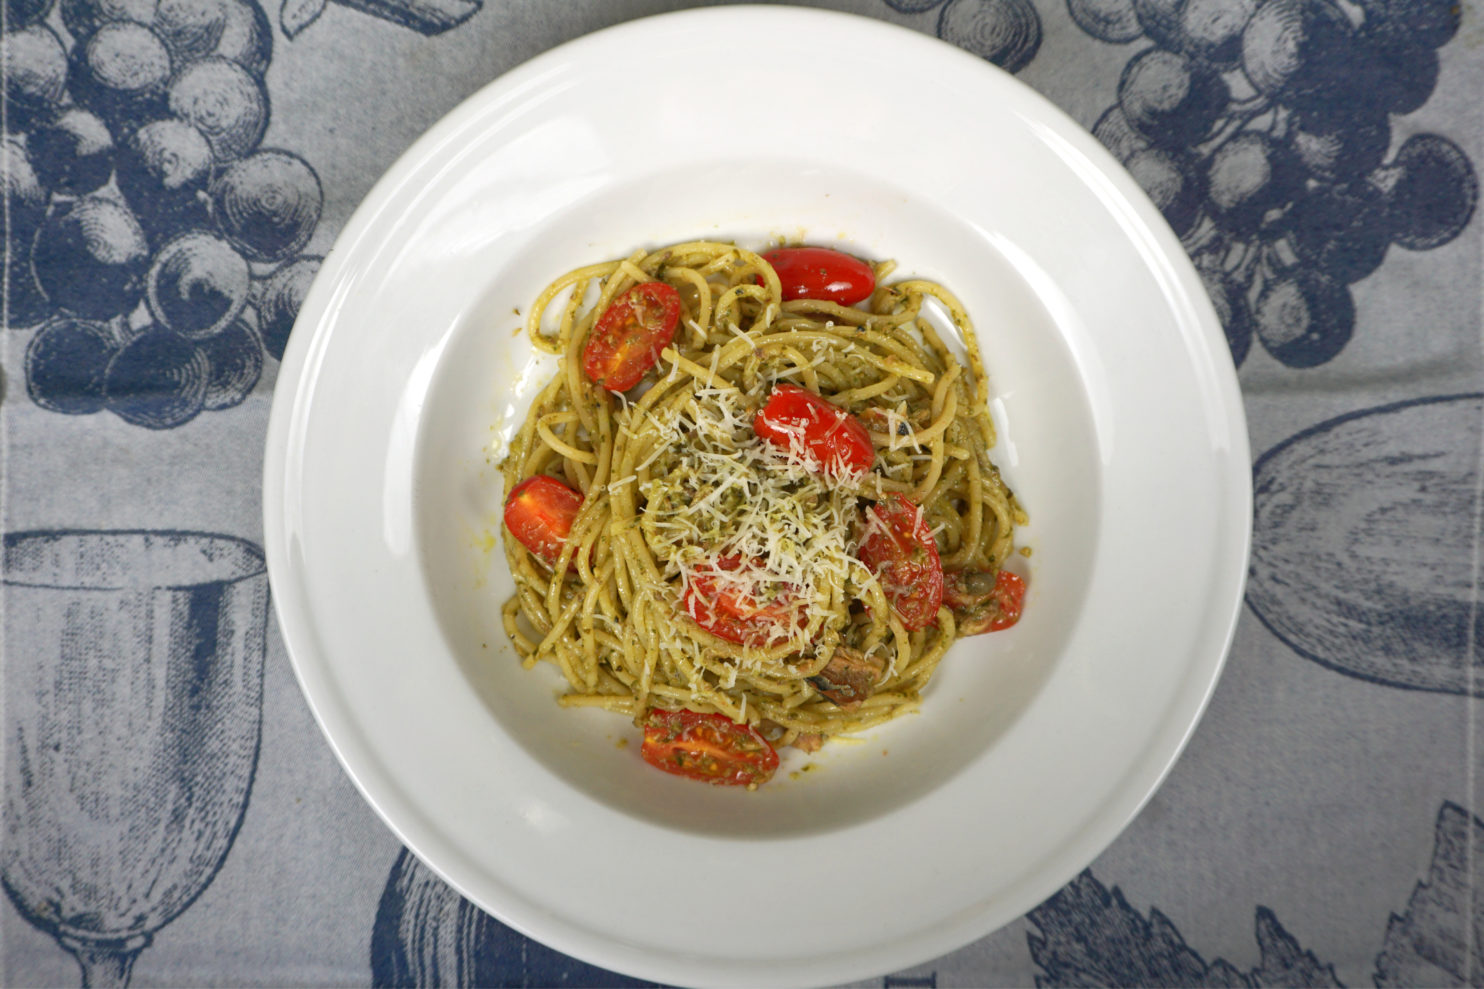 Healthy pasta dish with pesto